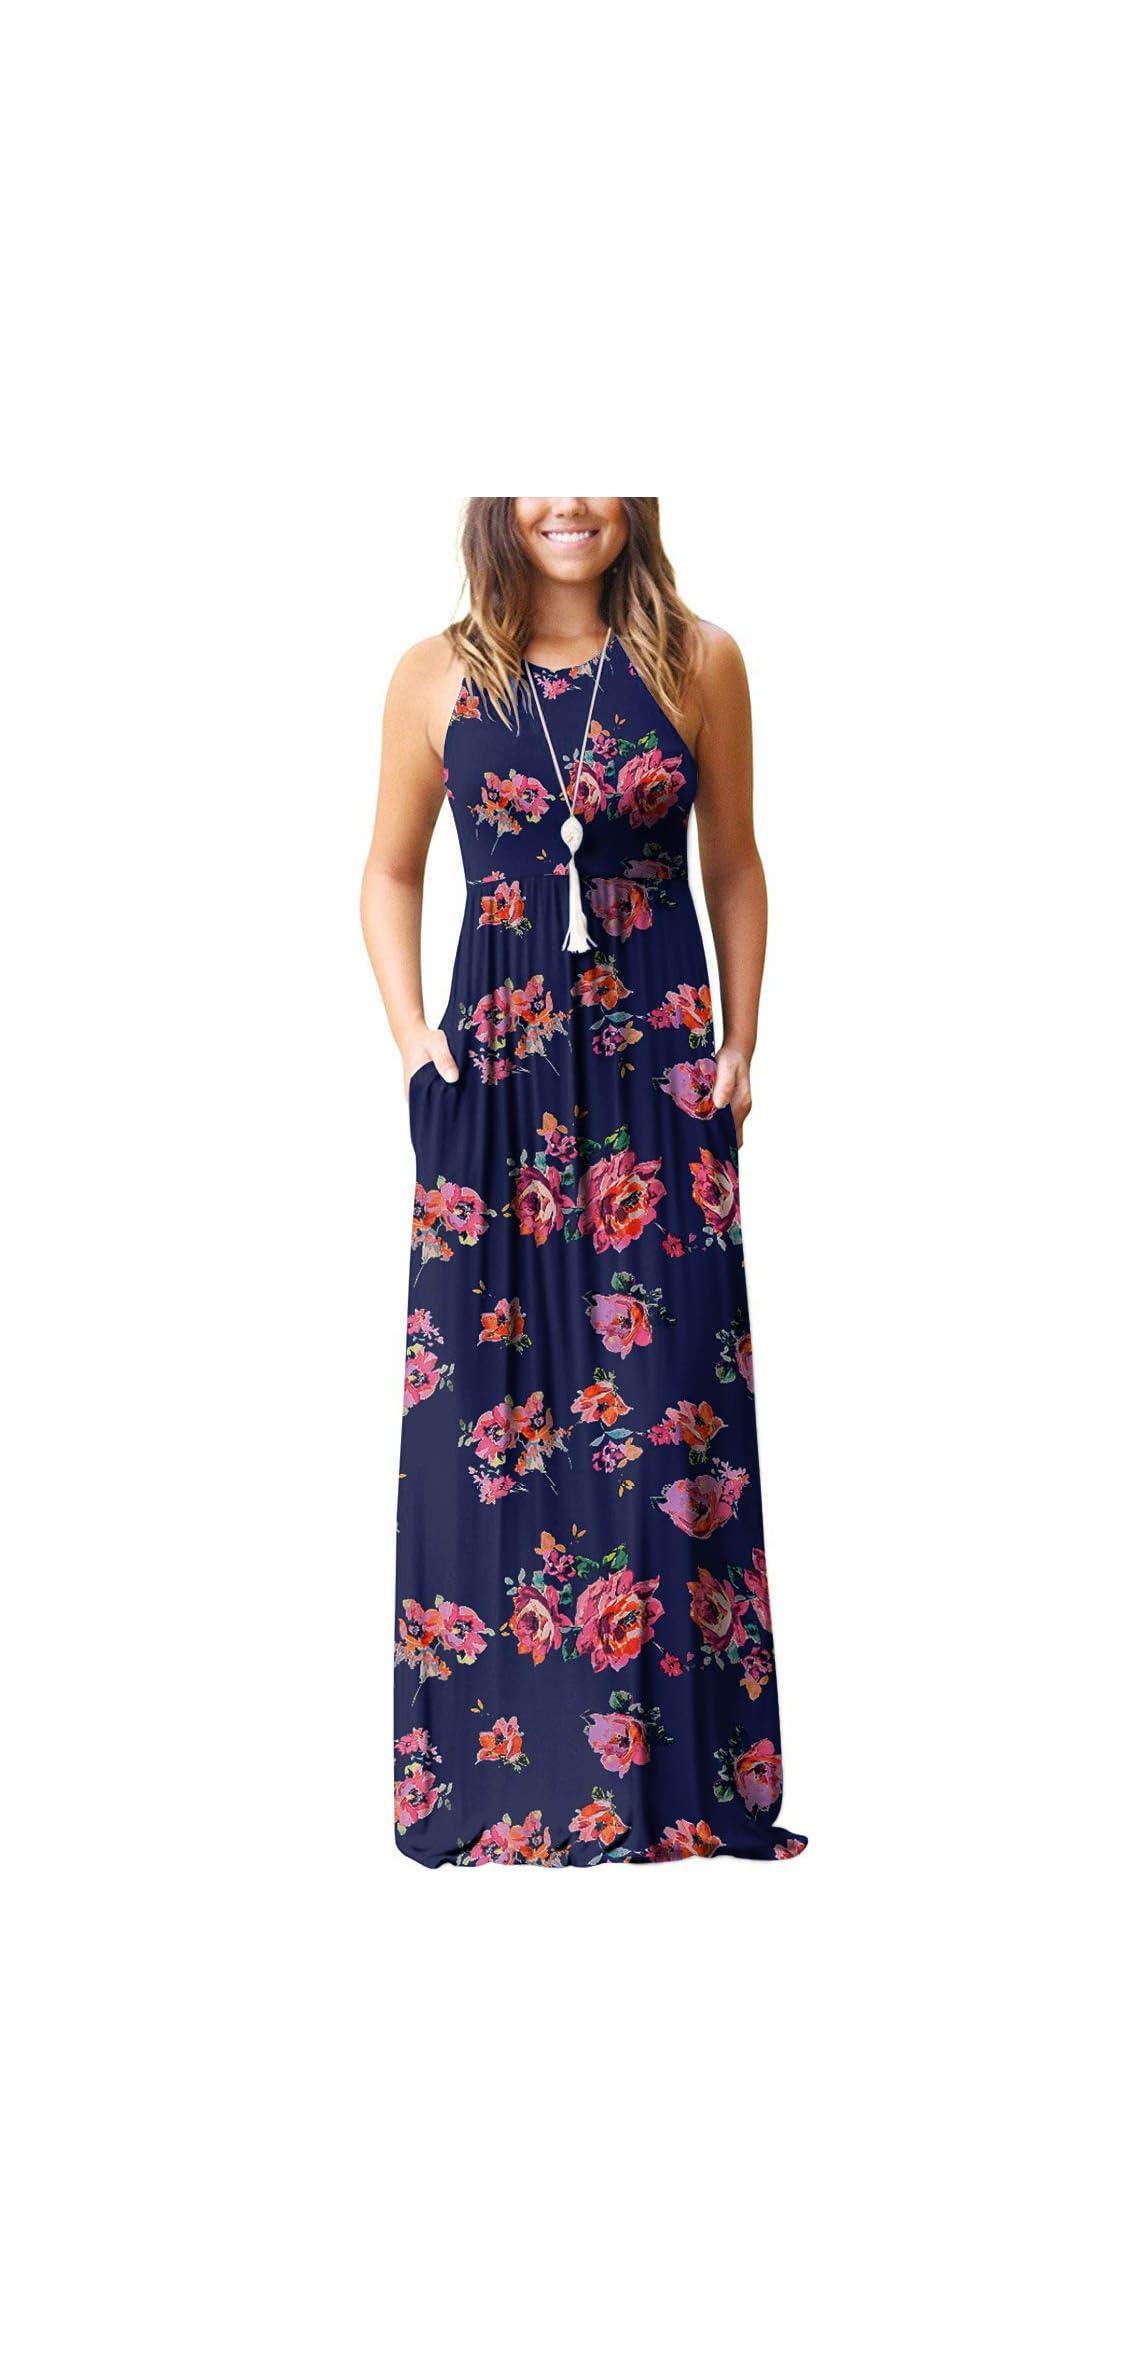 Women's Sleeveless Racerback Loose Plain Maxi Dresses